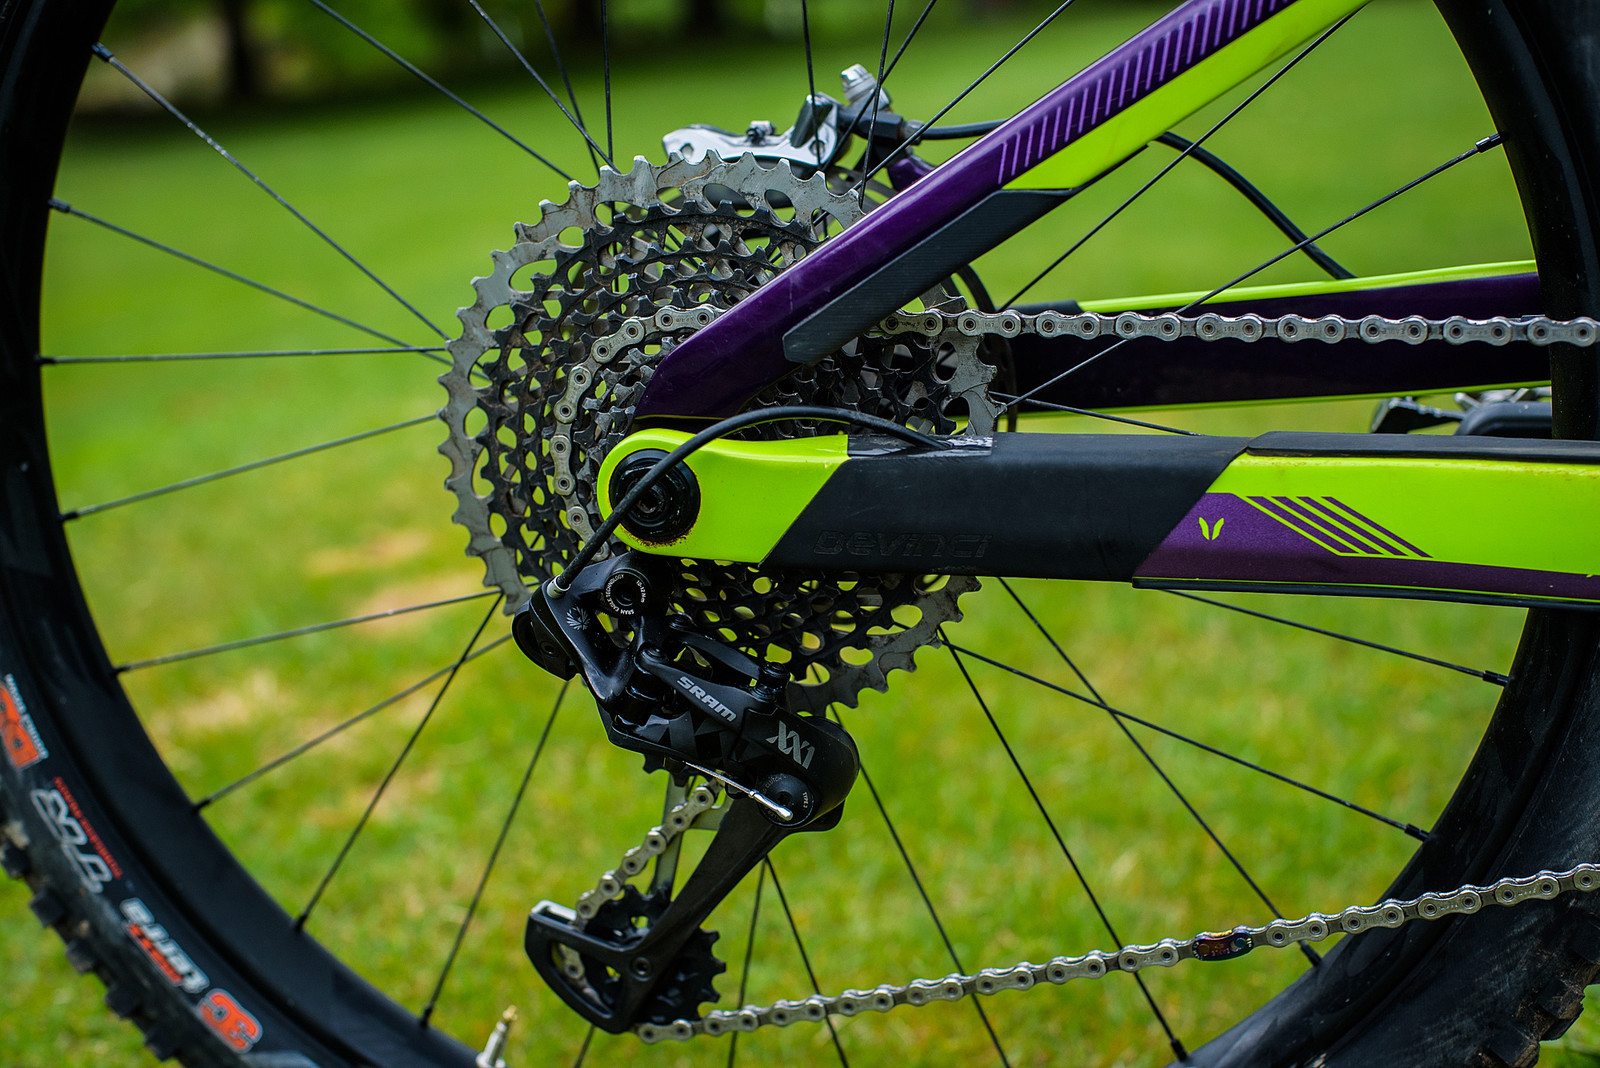 10-50t SRAM Eagle Cassette with XX1 Rear Derailleur - Pro Bike Check: Keegan Wright's Devinci Spartan Carbon - Mountain Biking Pictures - Vital MTB